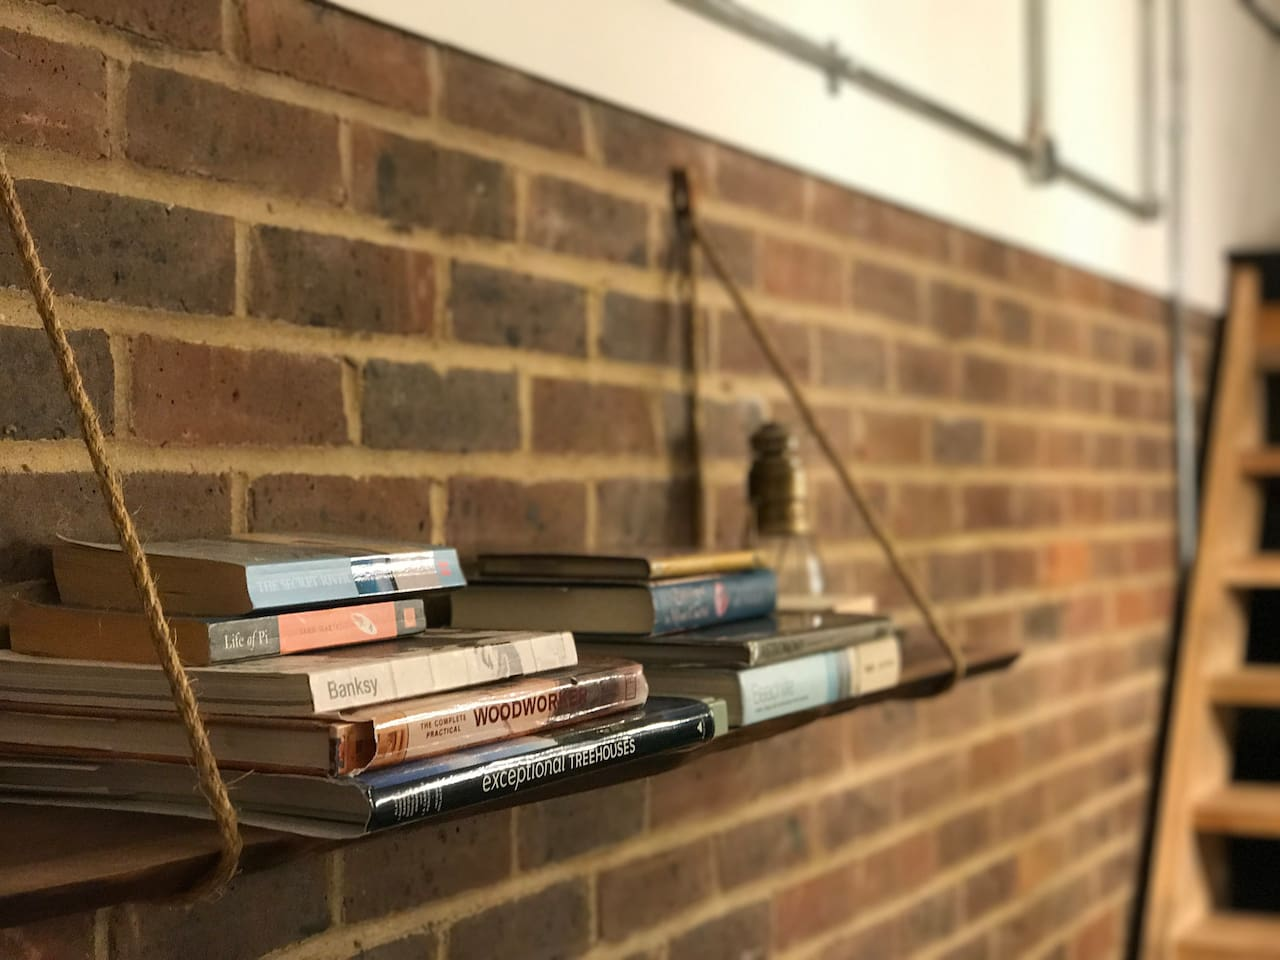 Selection of inspiring books